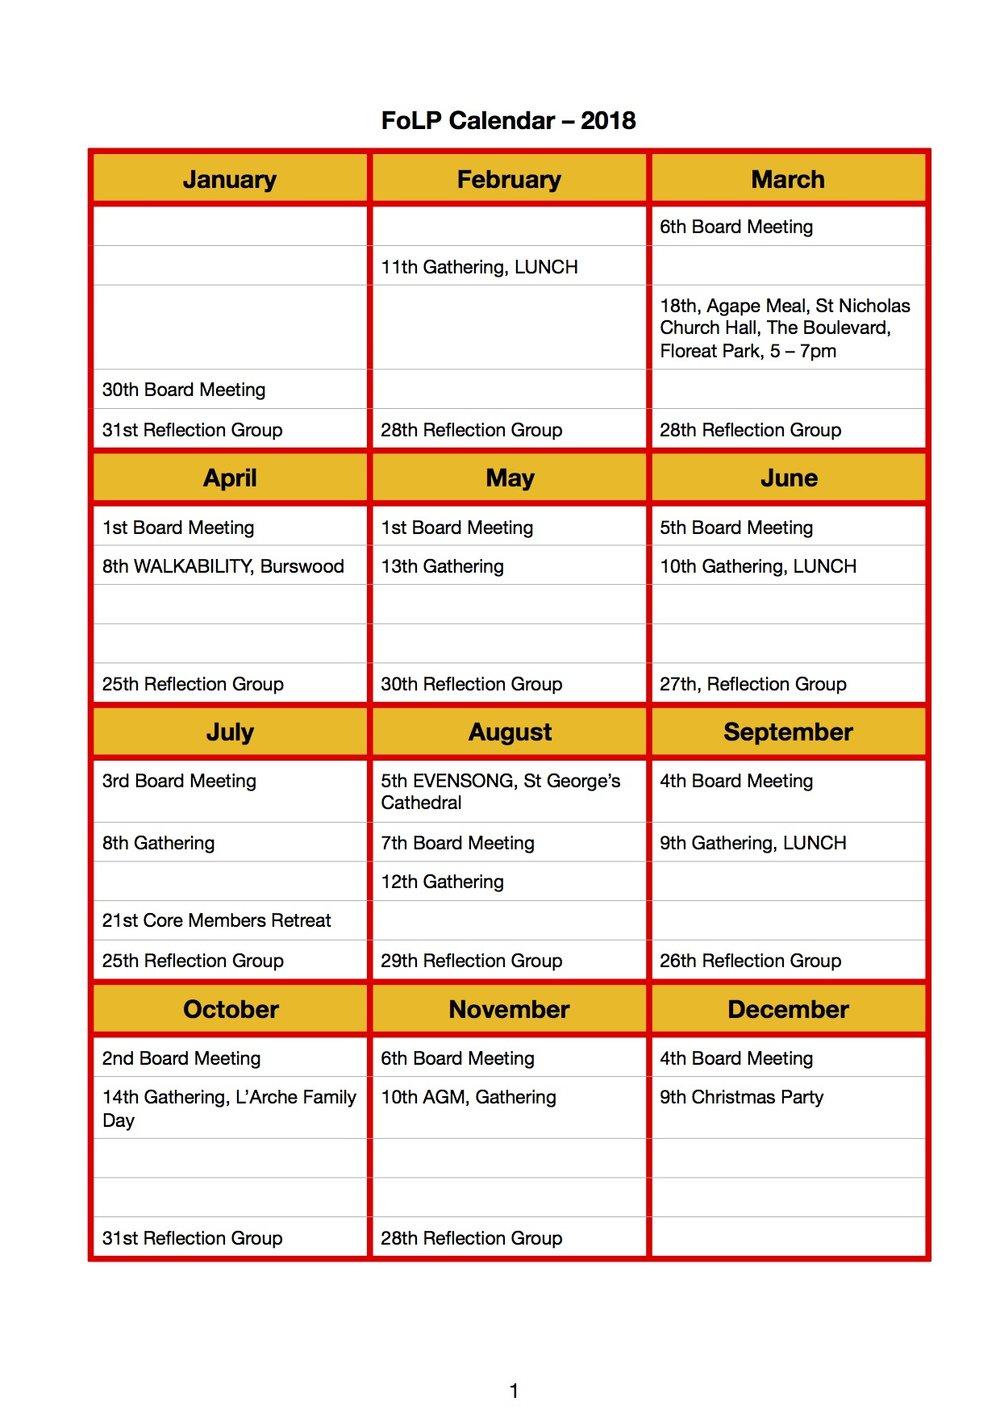 FoLP Calendar 2018.jpg